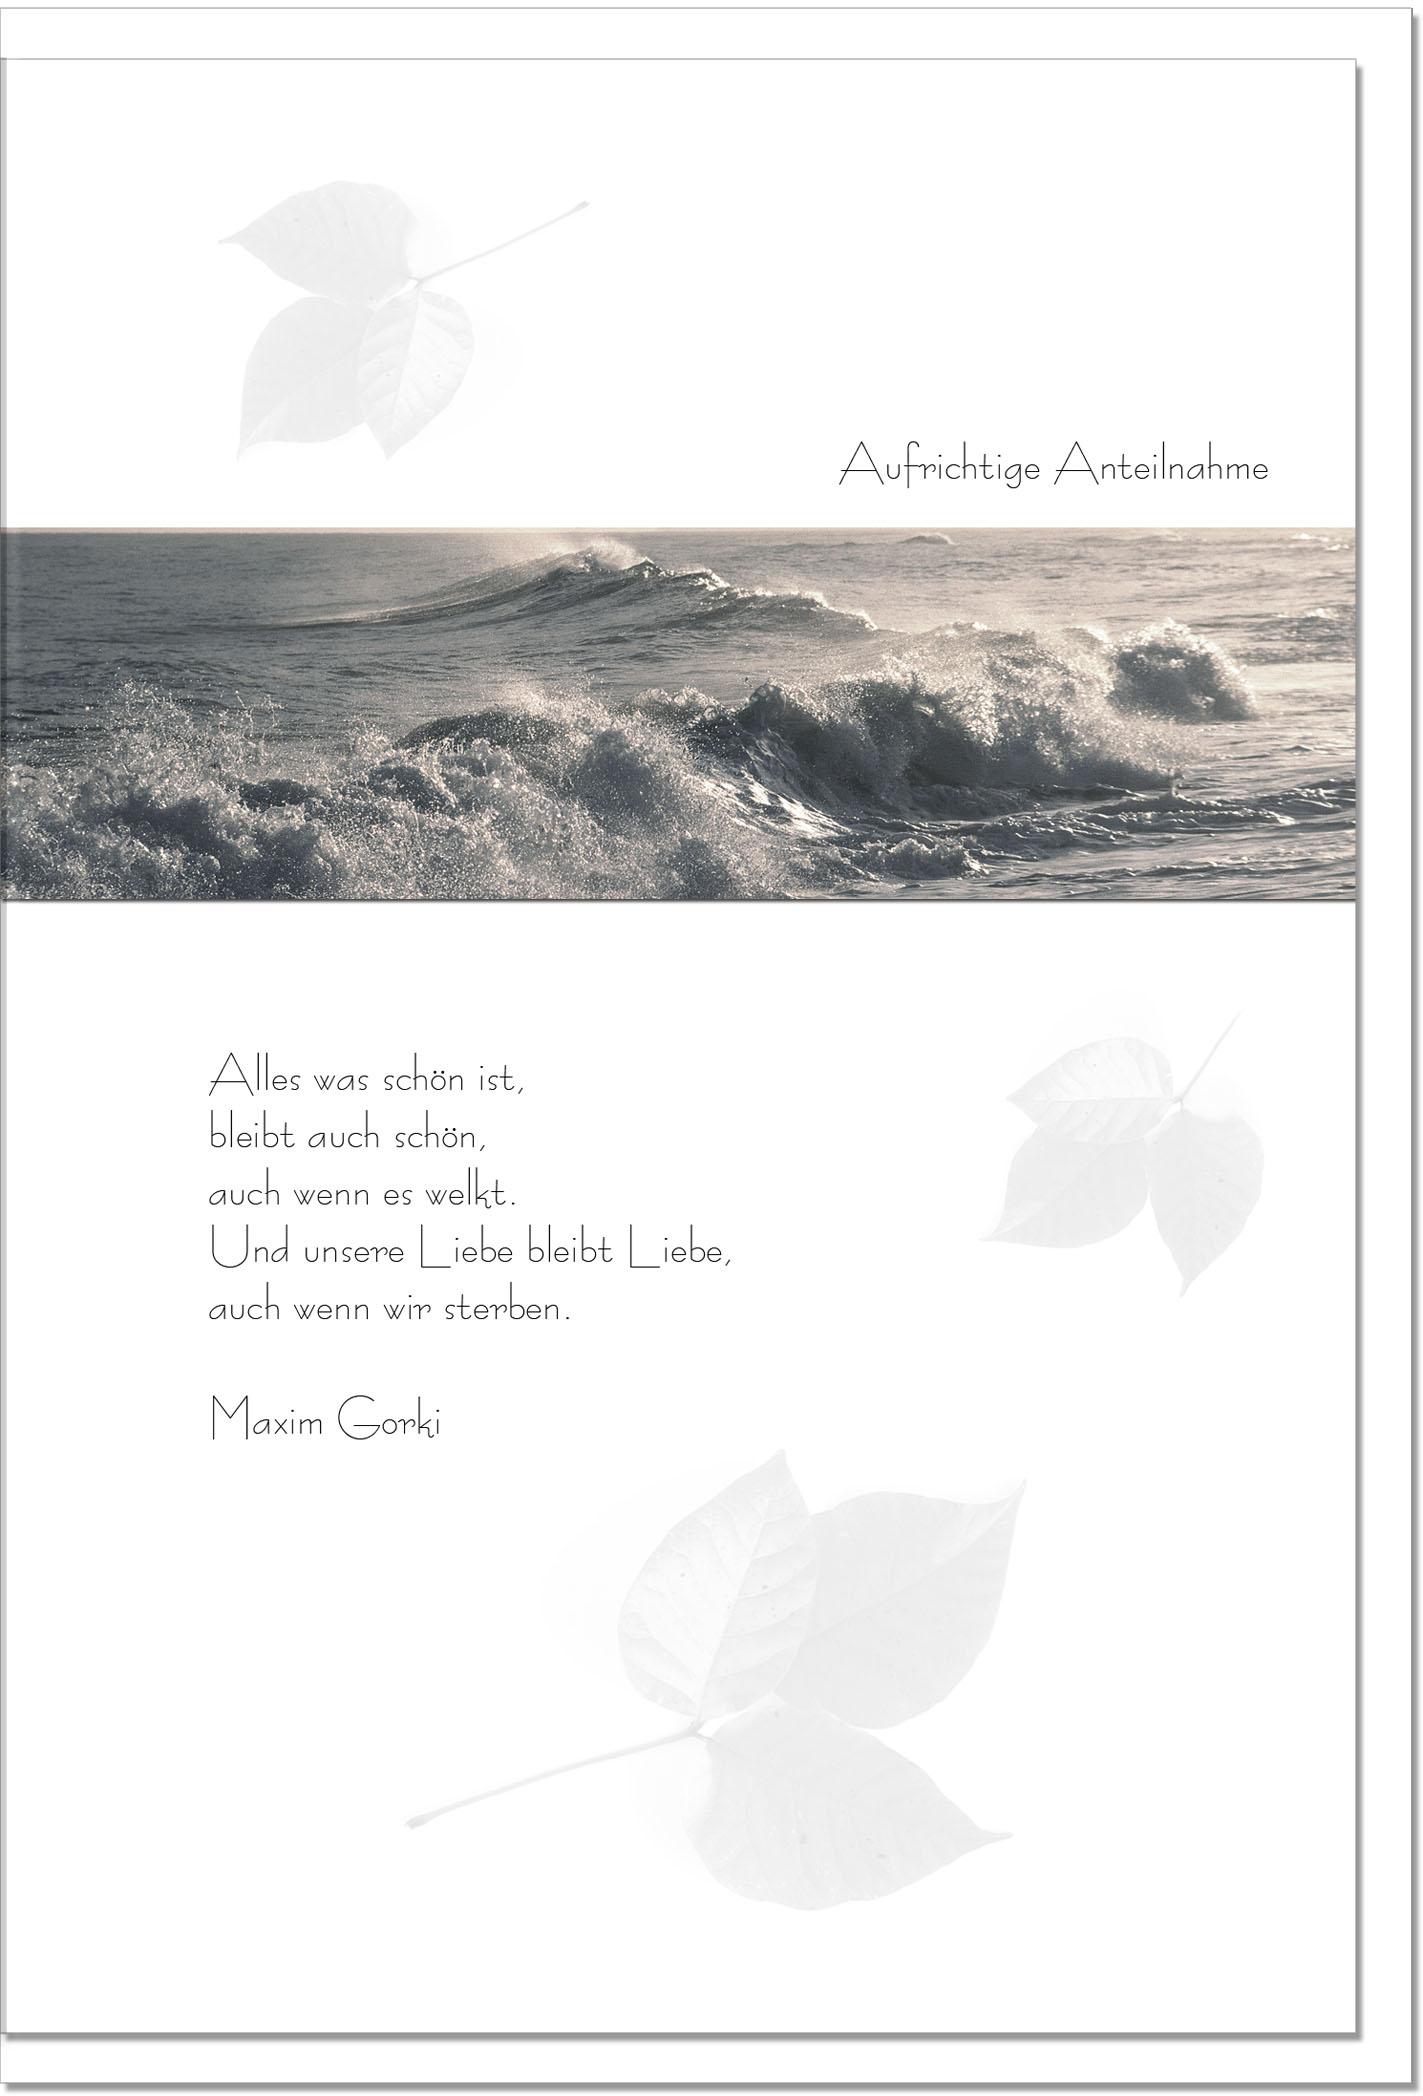 Trauerkarte DIE LIEBE BLEIBT | Brandung | metALUm #00078